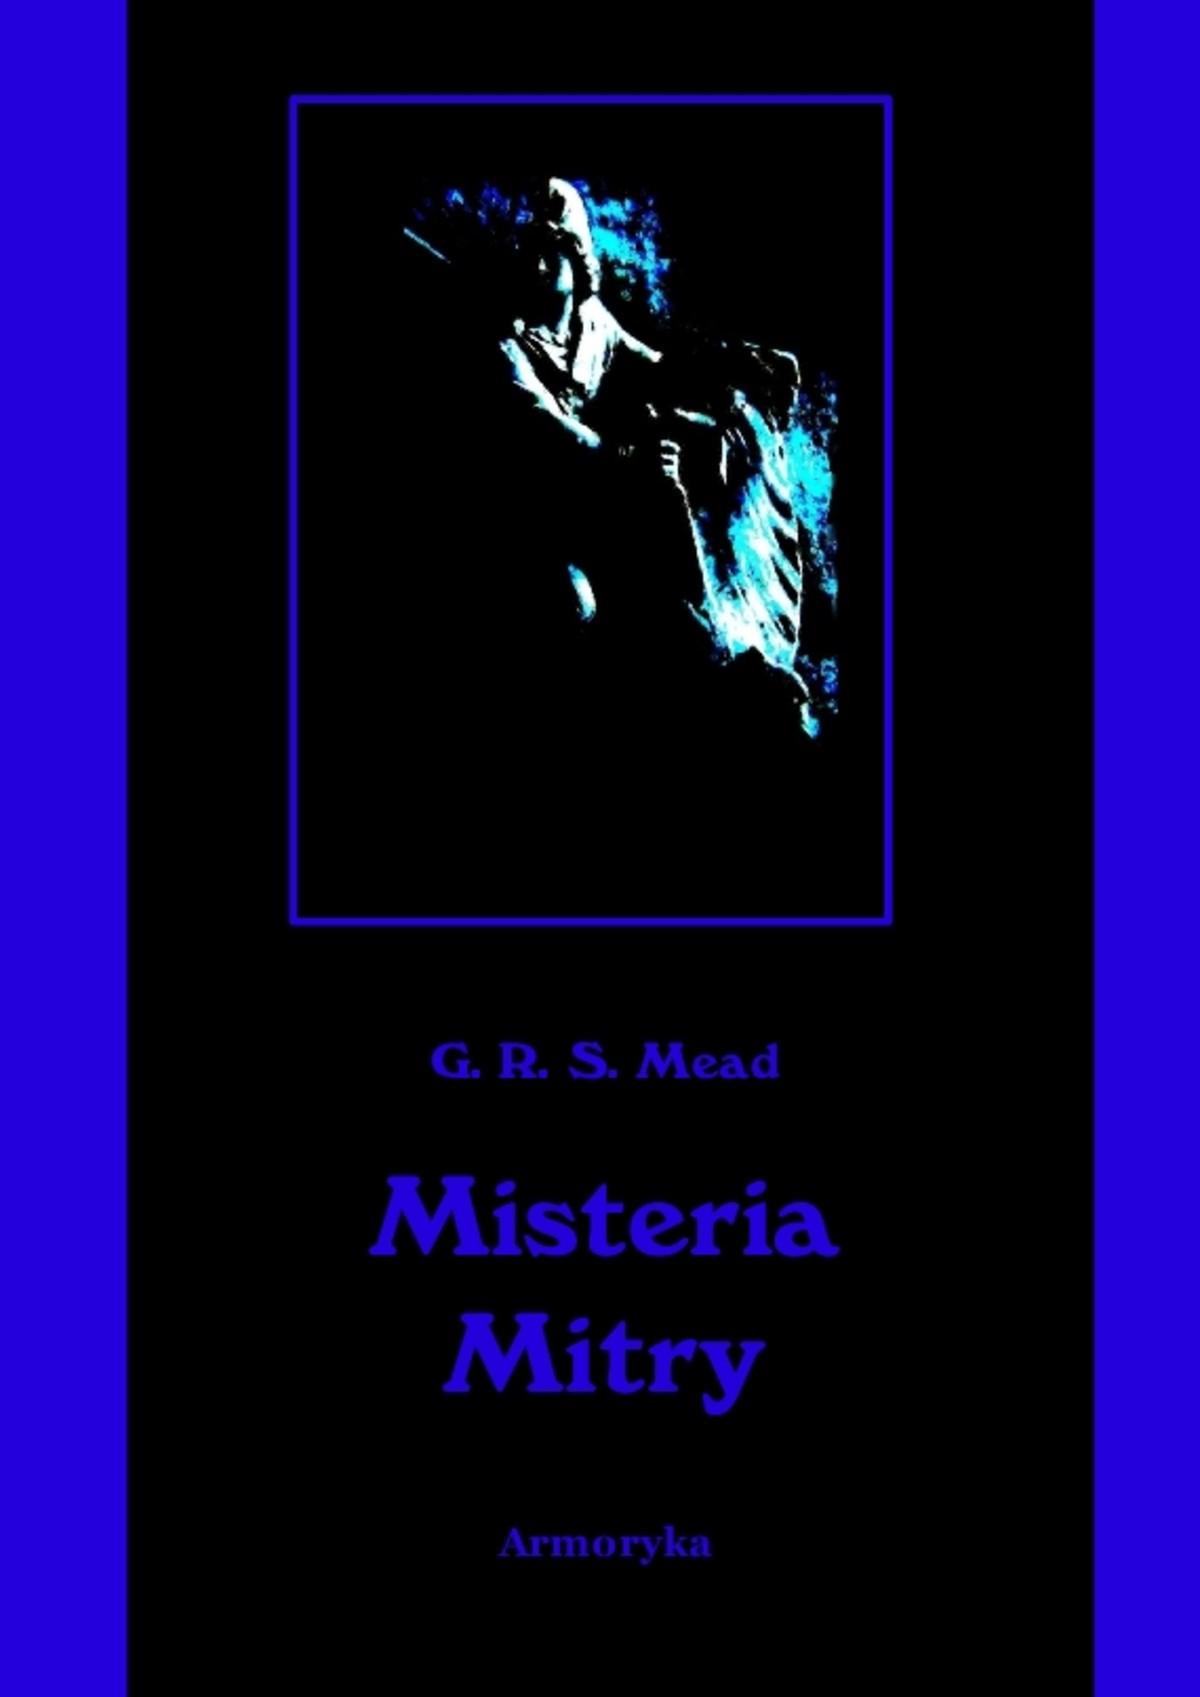 Misteria Mitry ebook